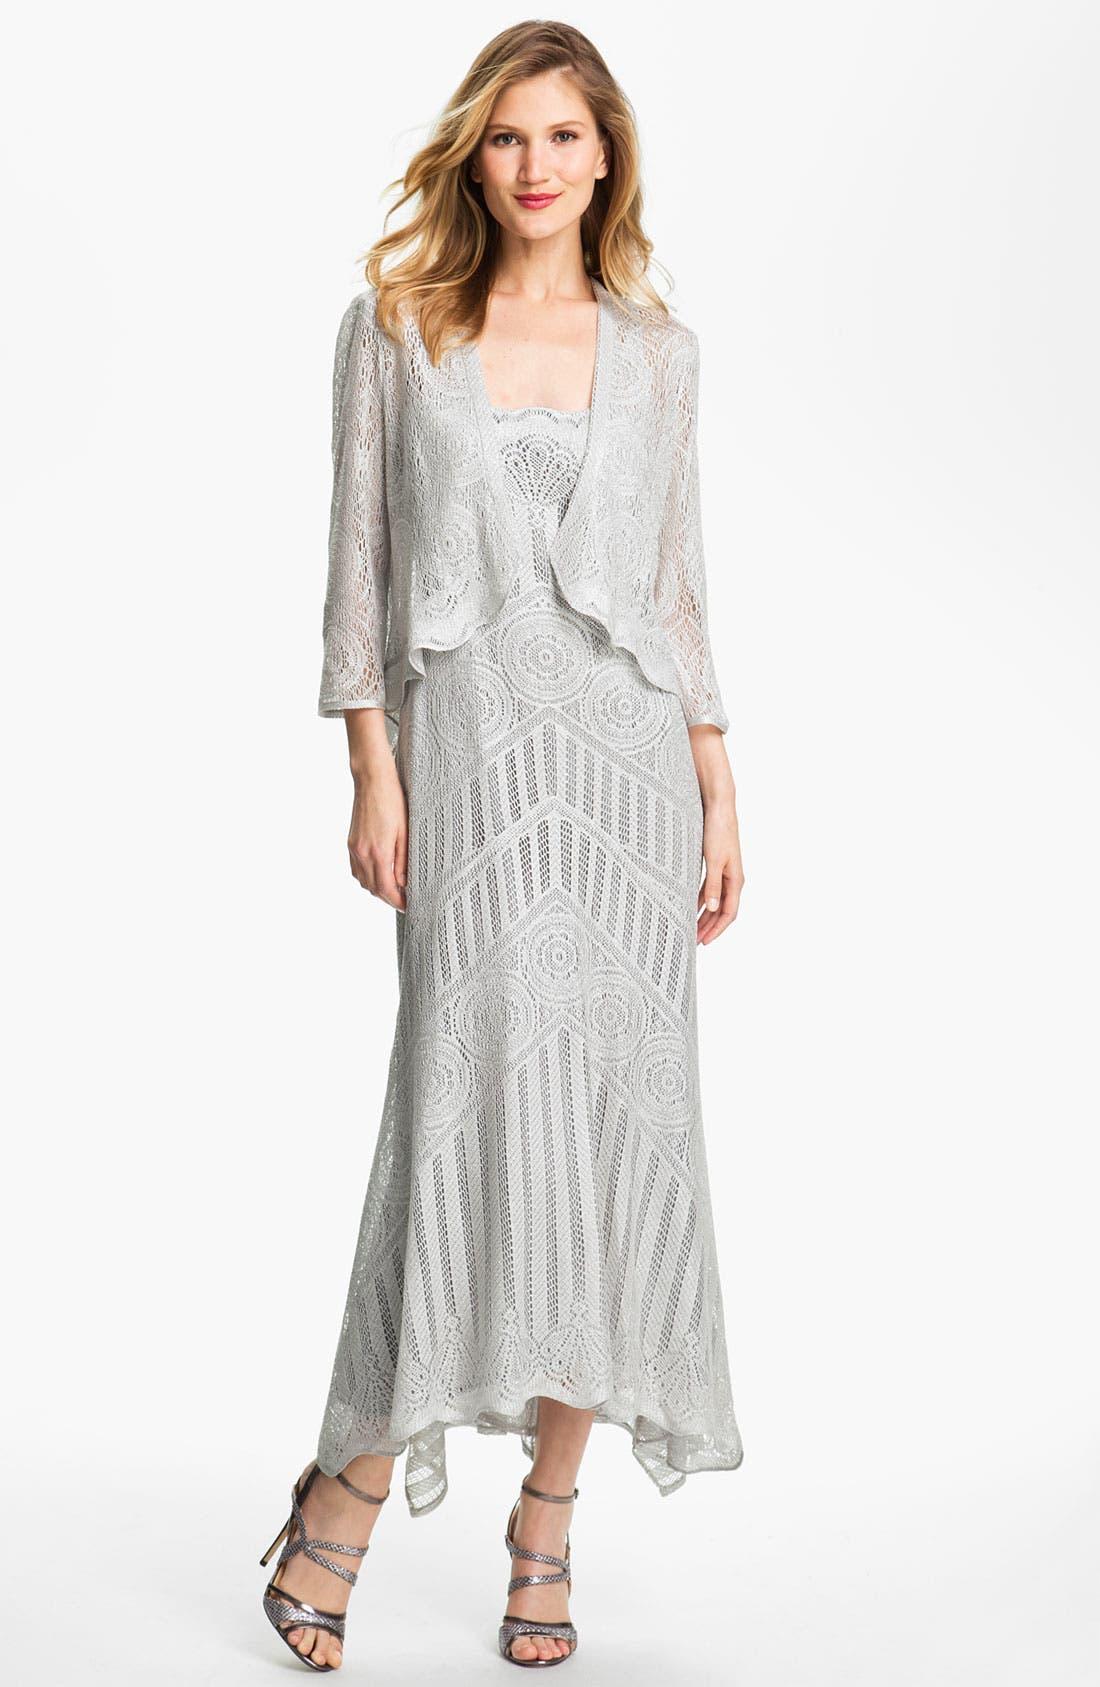 Main Image - Damianou Multi Strap Crocheted Dress & Jacket